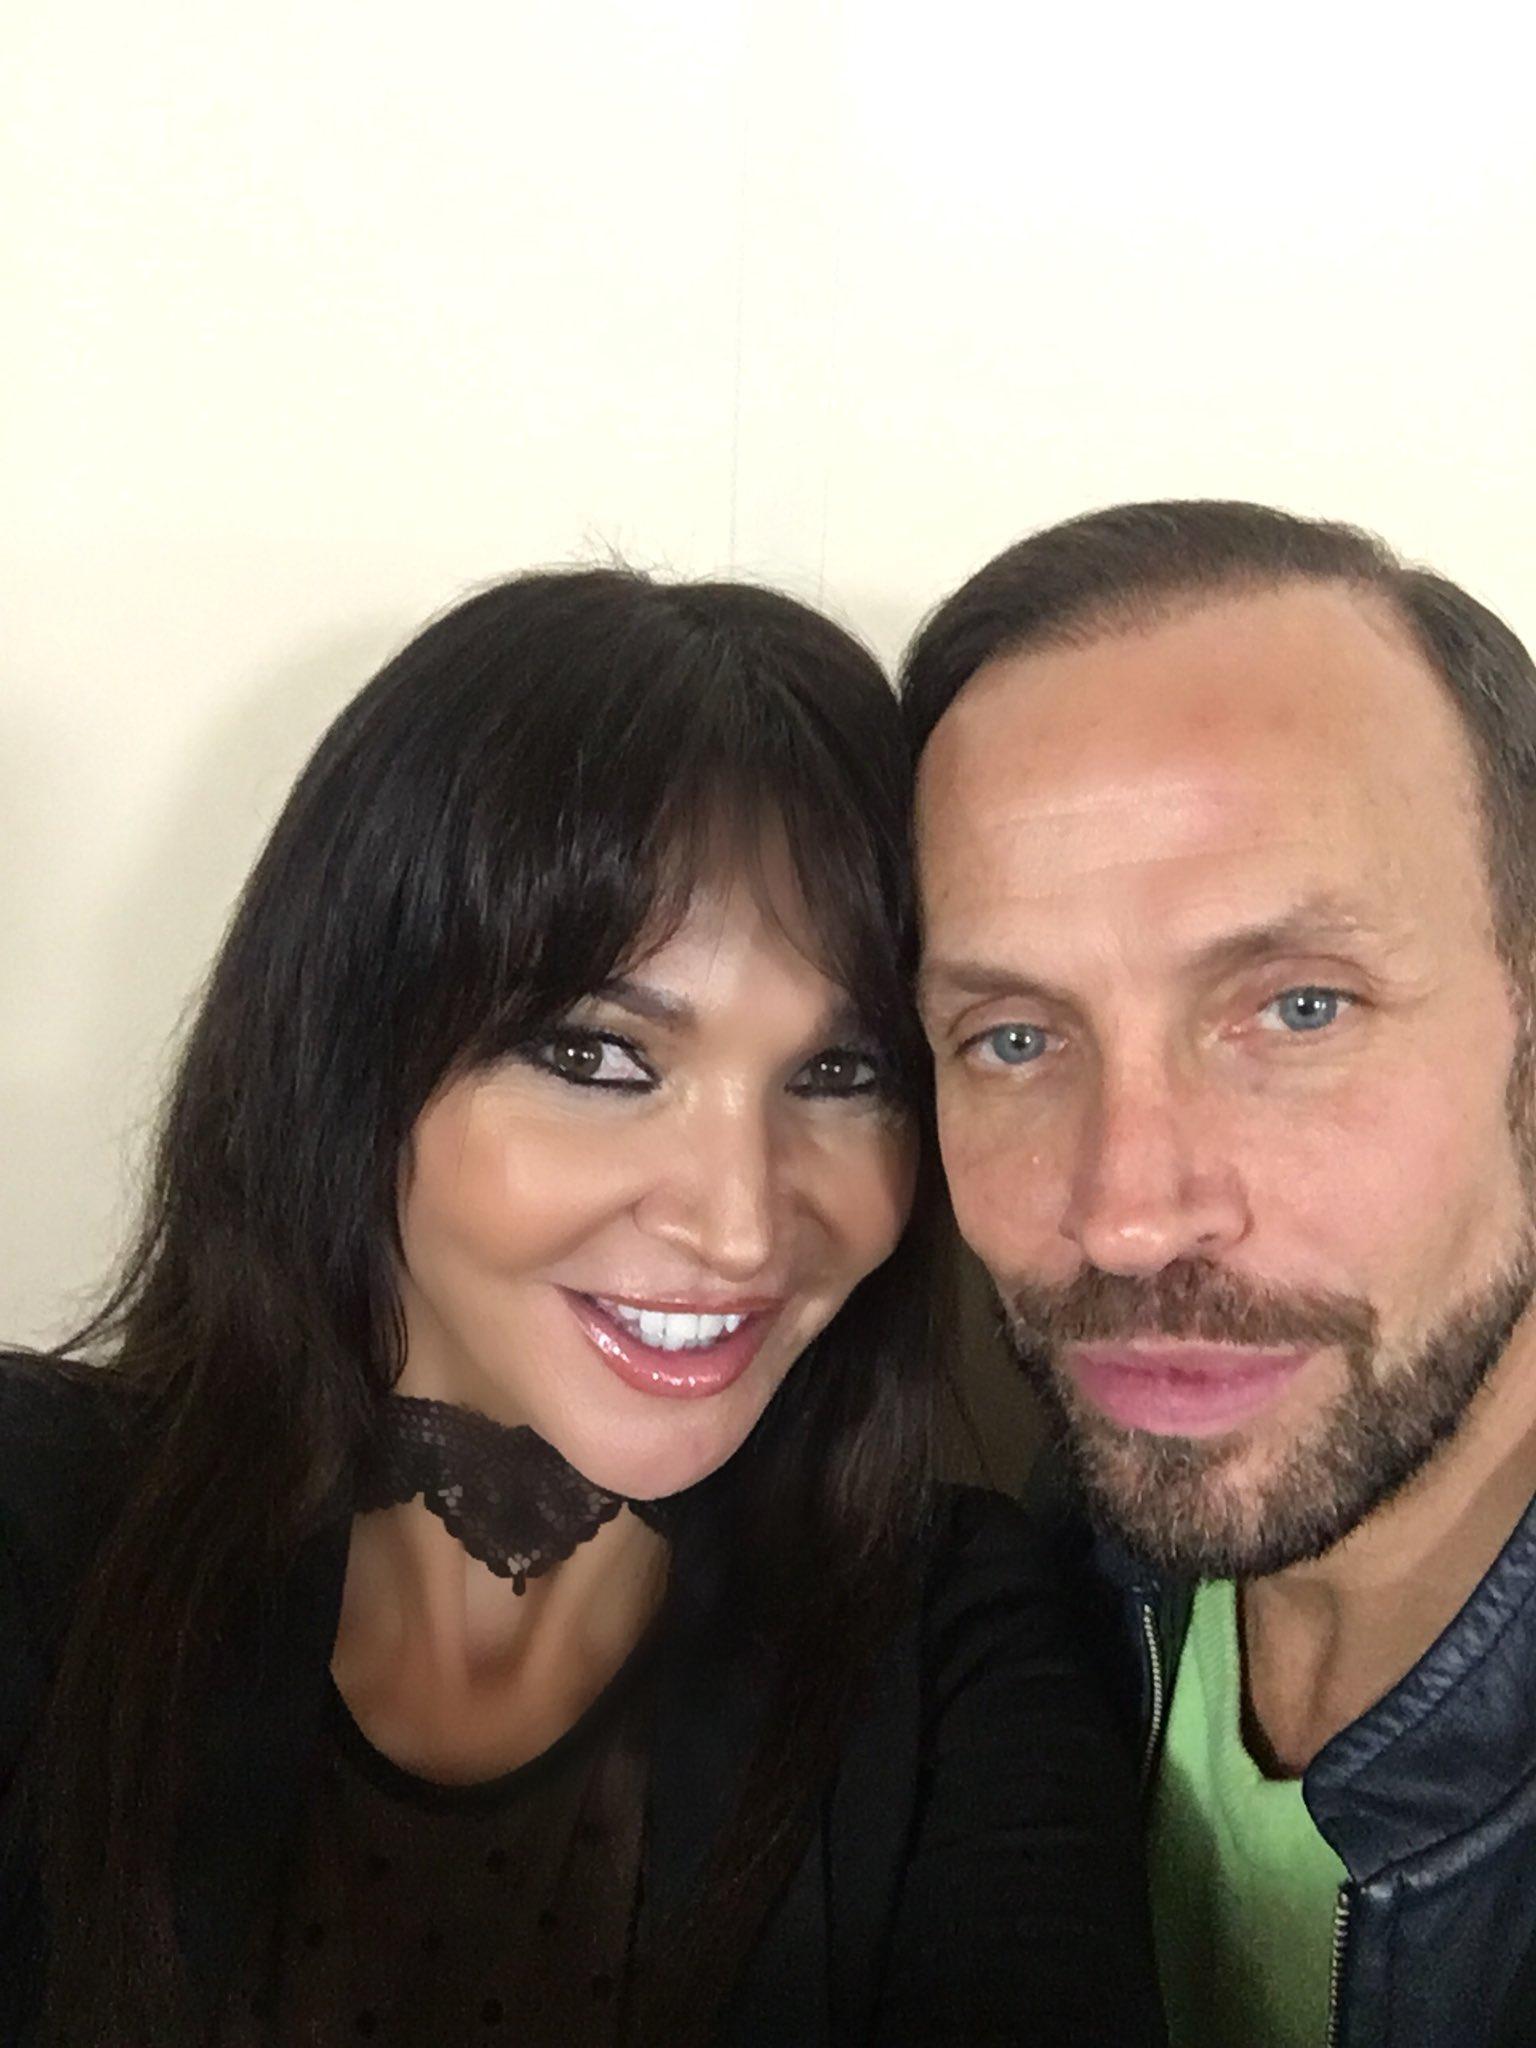 Glowing after @SkeyndorUK facial @LisaHarrisSkin with my lovely @officialJasonG @dancingonice @itv #glowing #skin https://t.co/nU8hTvFuvl